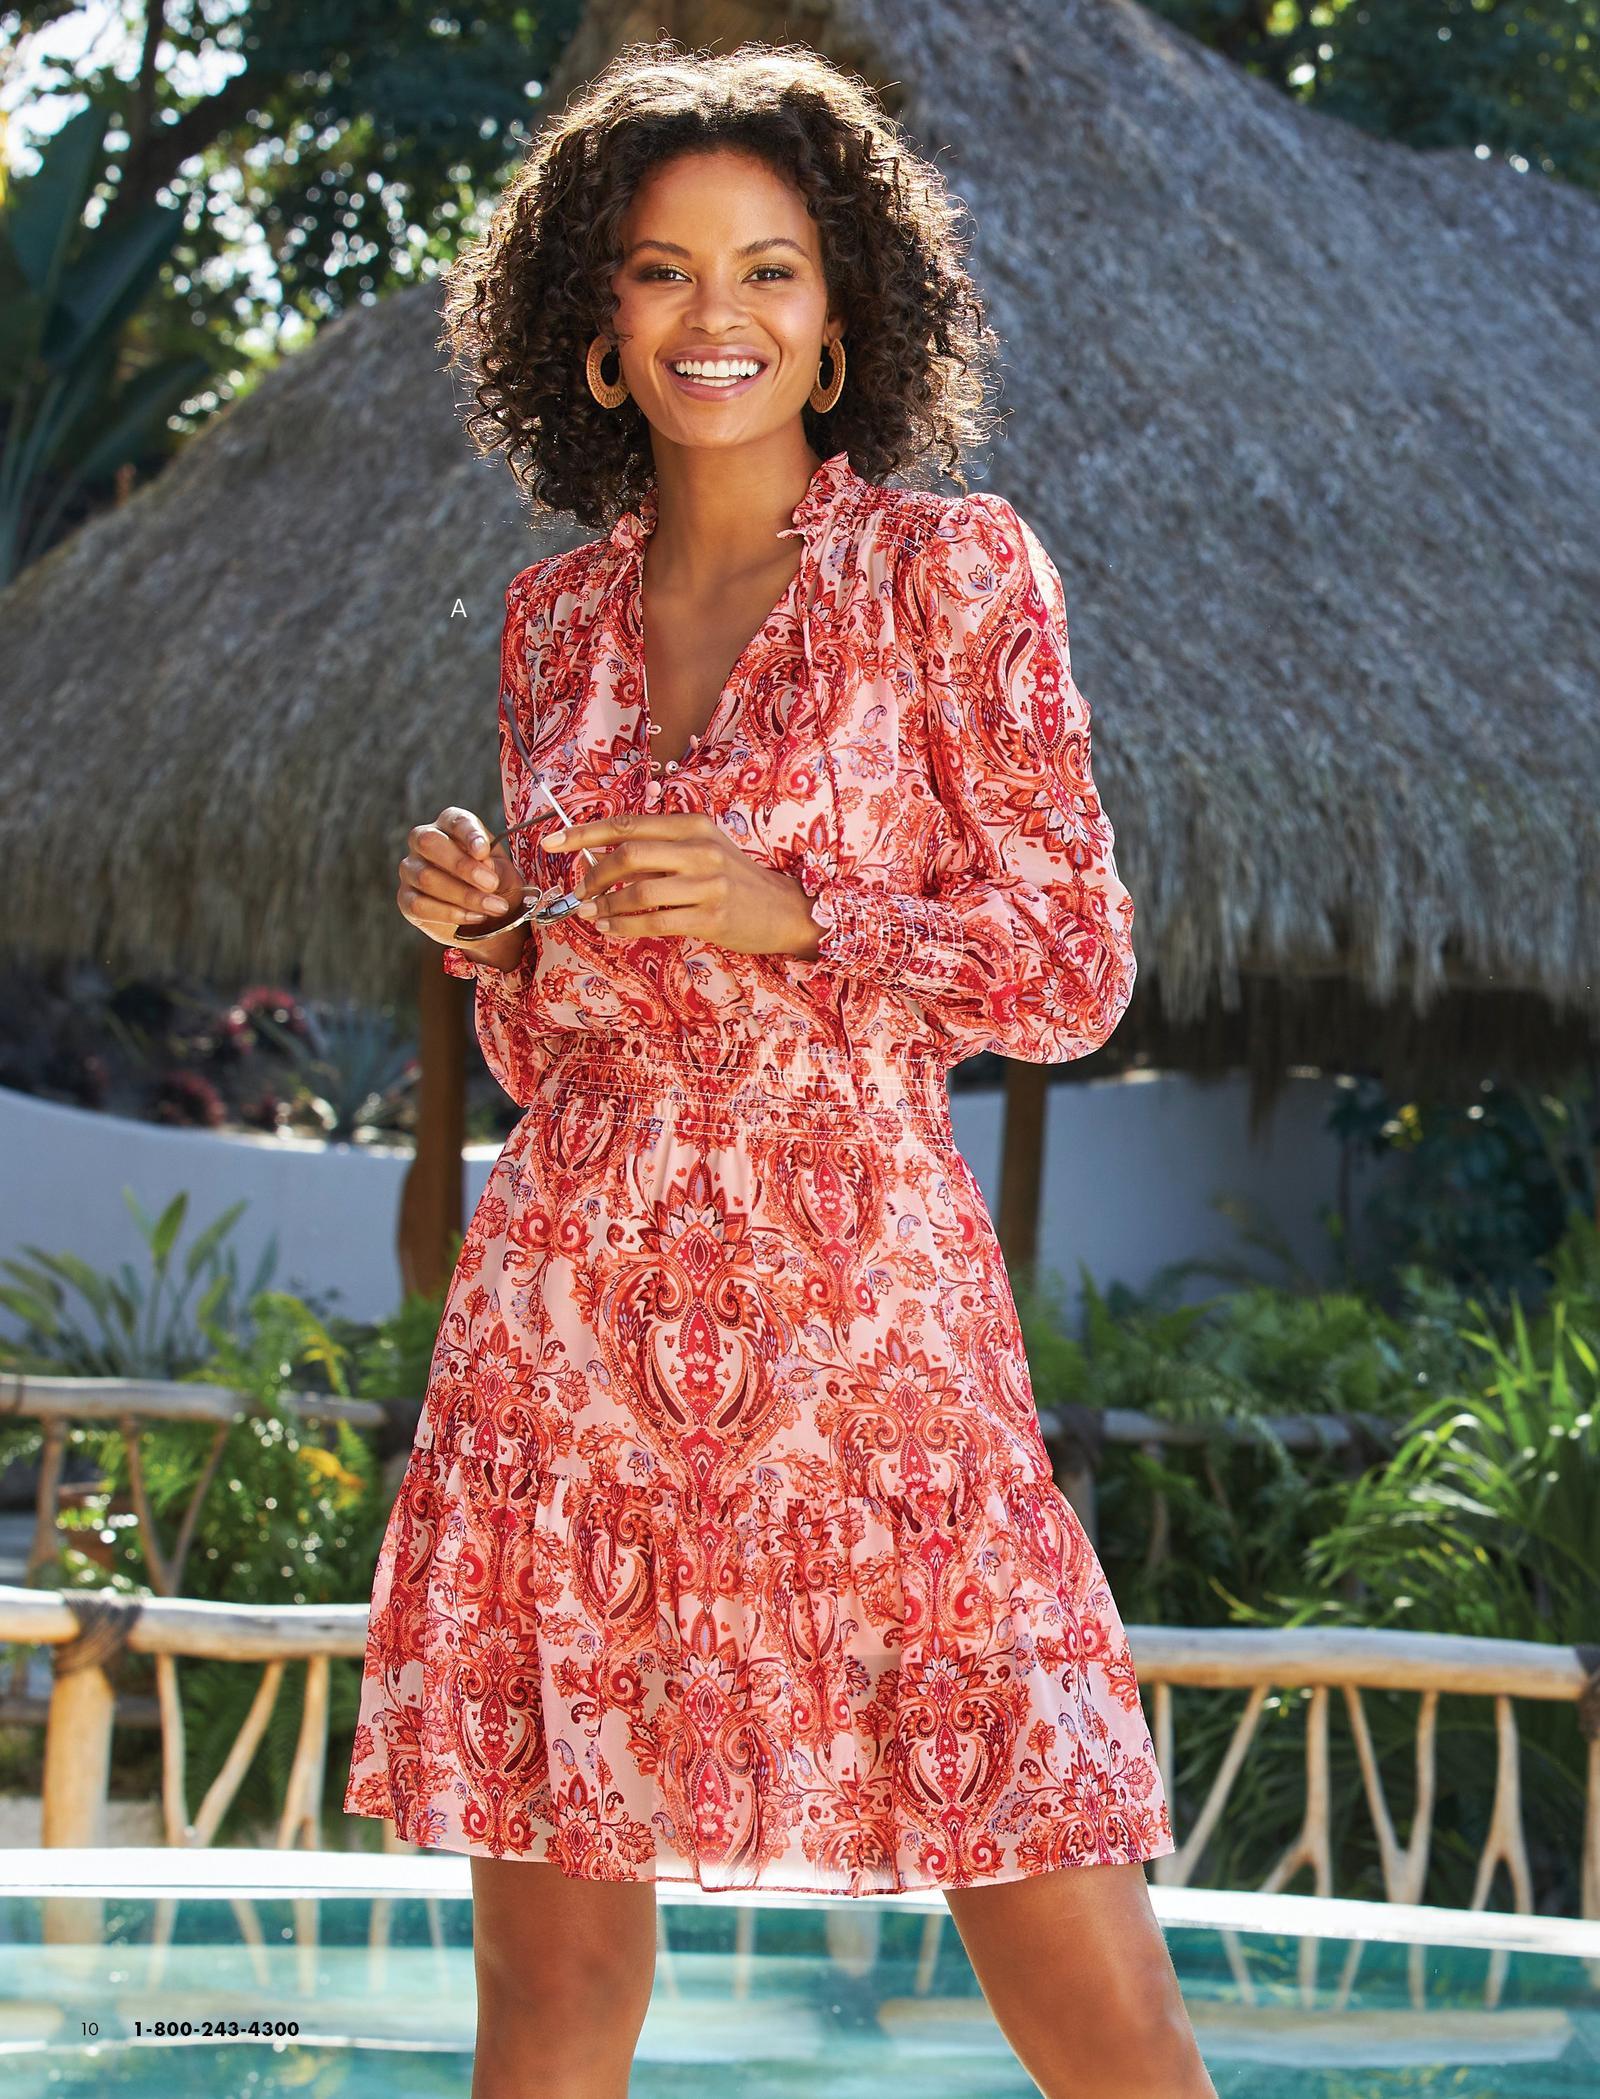 model wearing a pink boho printed long-sleeve smocked dress.